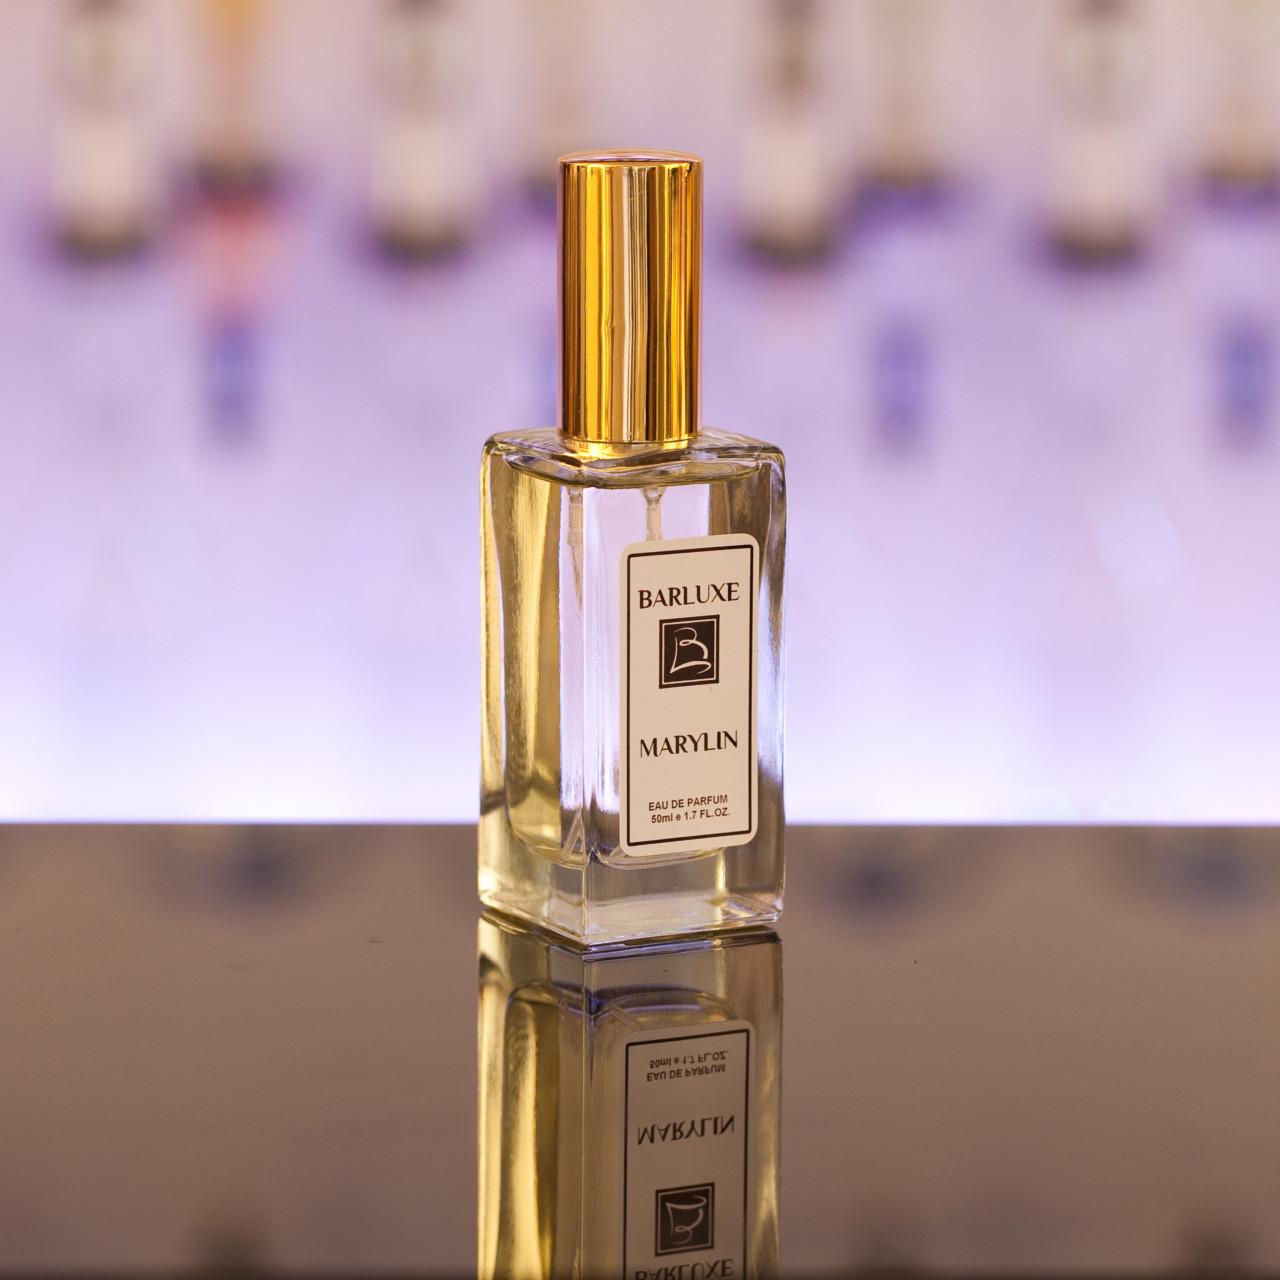 damen-parfum-dupe-double-duft-duftzwilling-marylin-2